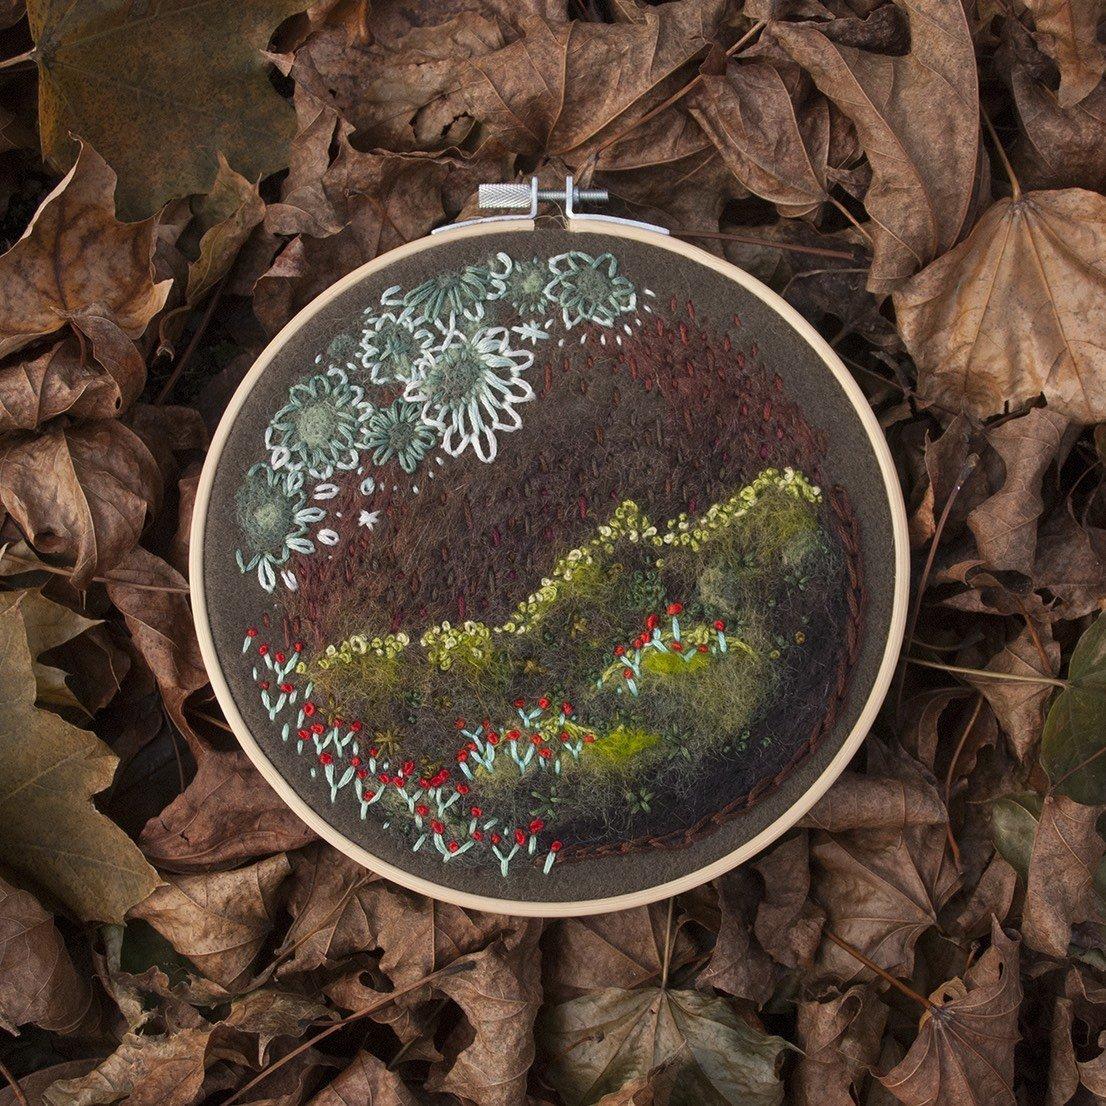 Marian Bolalek fiber artist at Waltham Virtual Studios